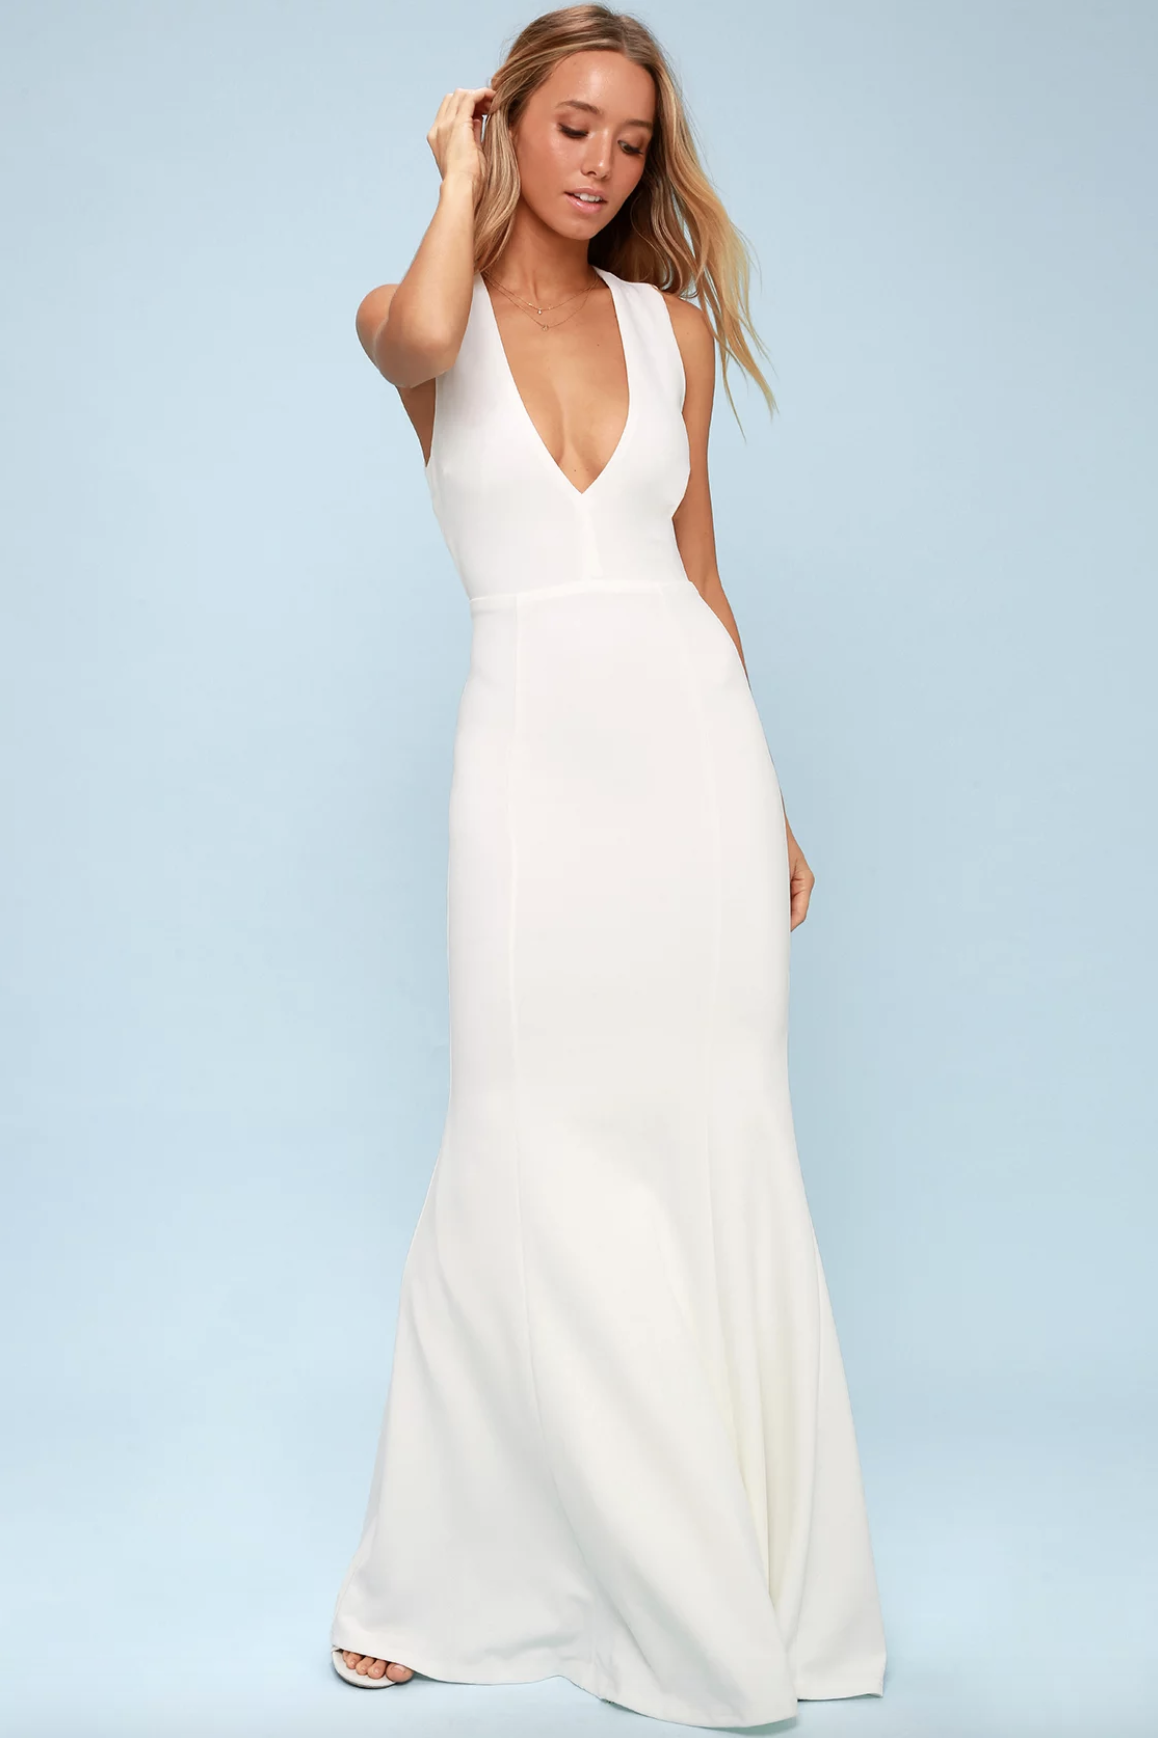 HEAVEN AND EARTH WHITE MAXI DRESS  Wedding Dress, Affordable Wedding Dress, Sleek, sexy modern wedding dress with open back. Mermaid style wedding dress. Cheap wedding dress.